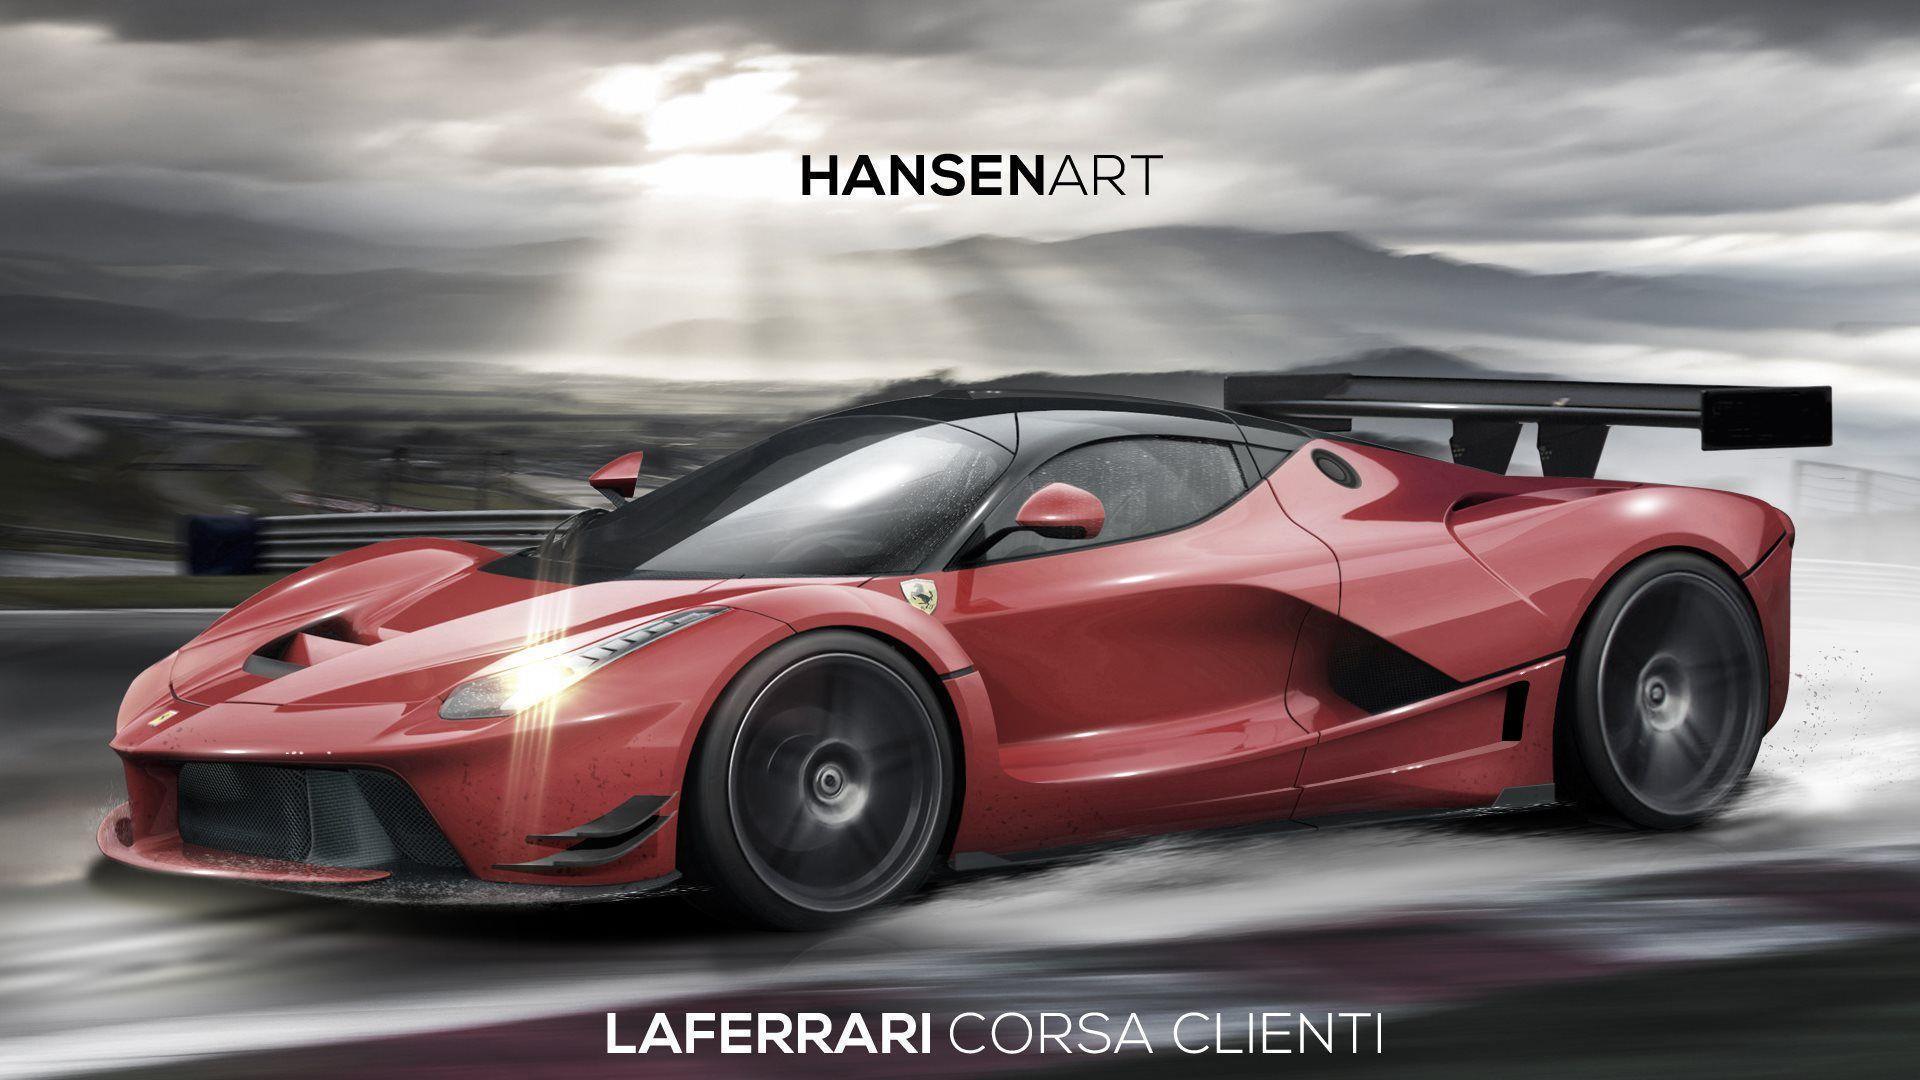 Ferrari LaFerrari Wallpapers - Wallpaper Cave